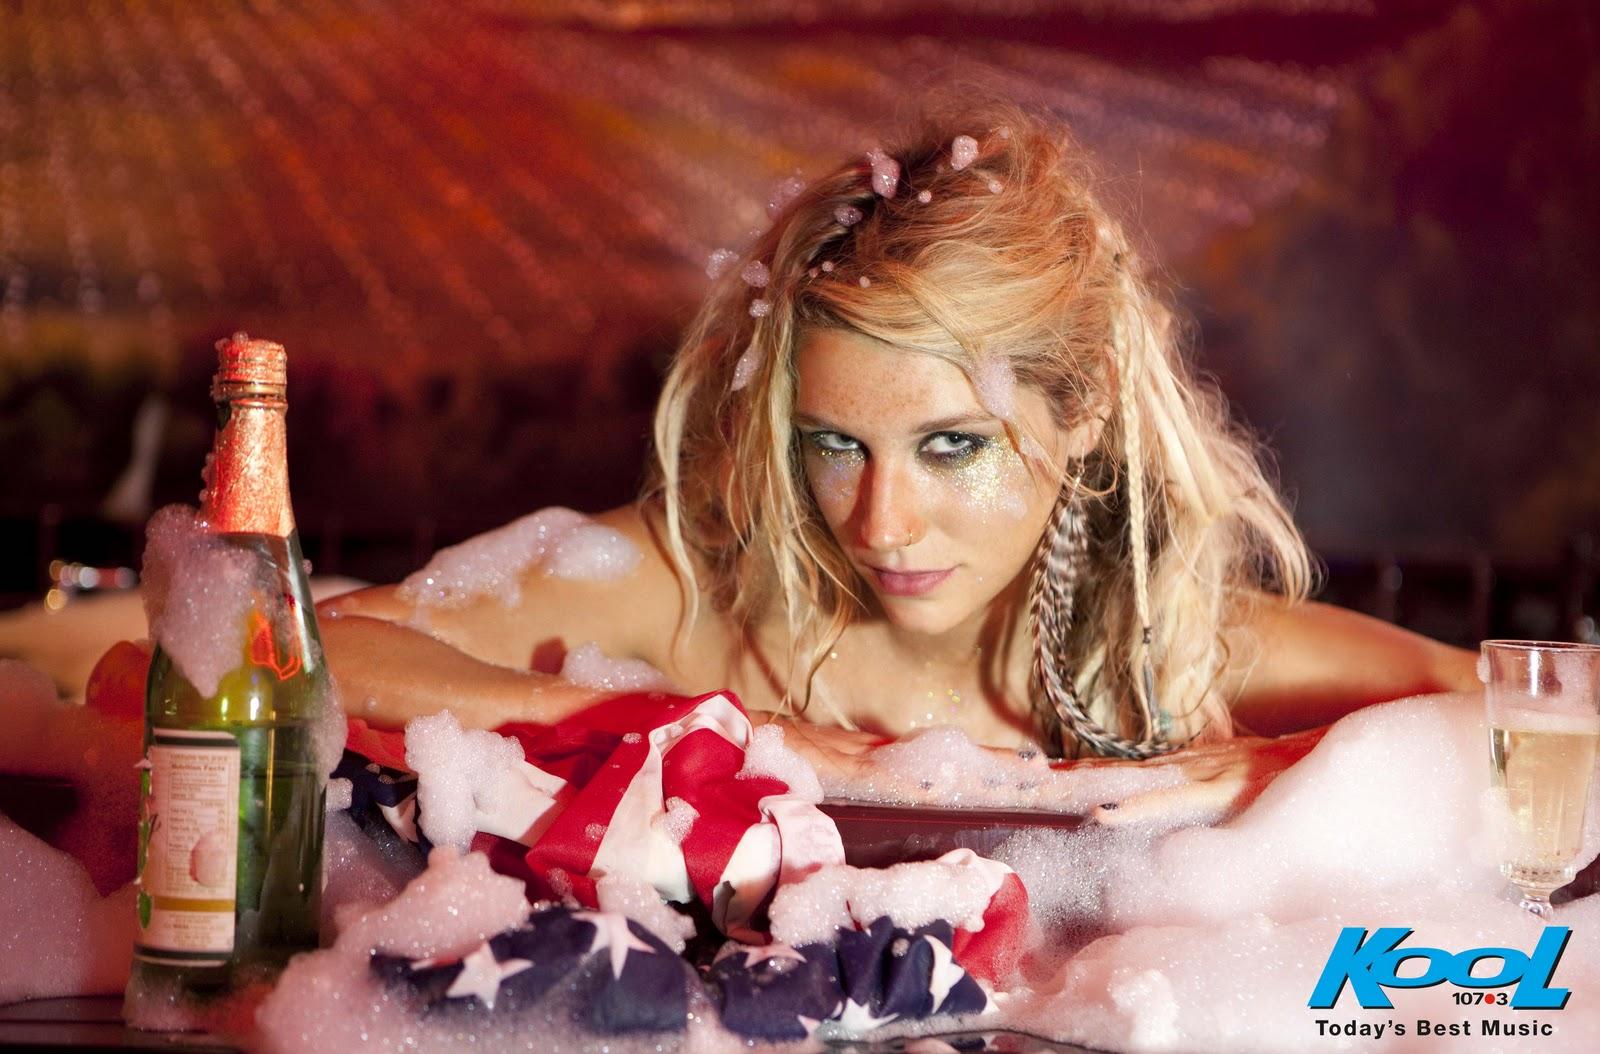 http://4.bp.blogspot.com/-eFdHTfsimI0/UFmmNiYAnpI/AAAAAAAADGQ/NHlP_CLI2kM/s1600/Kesha-Wallpapers-2010-2.jpg